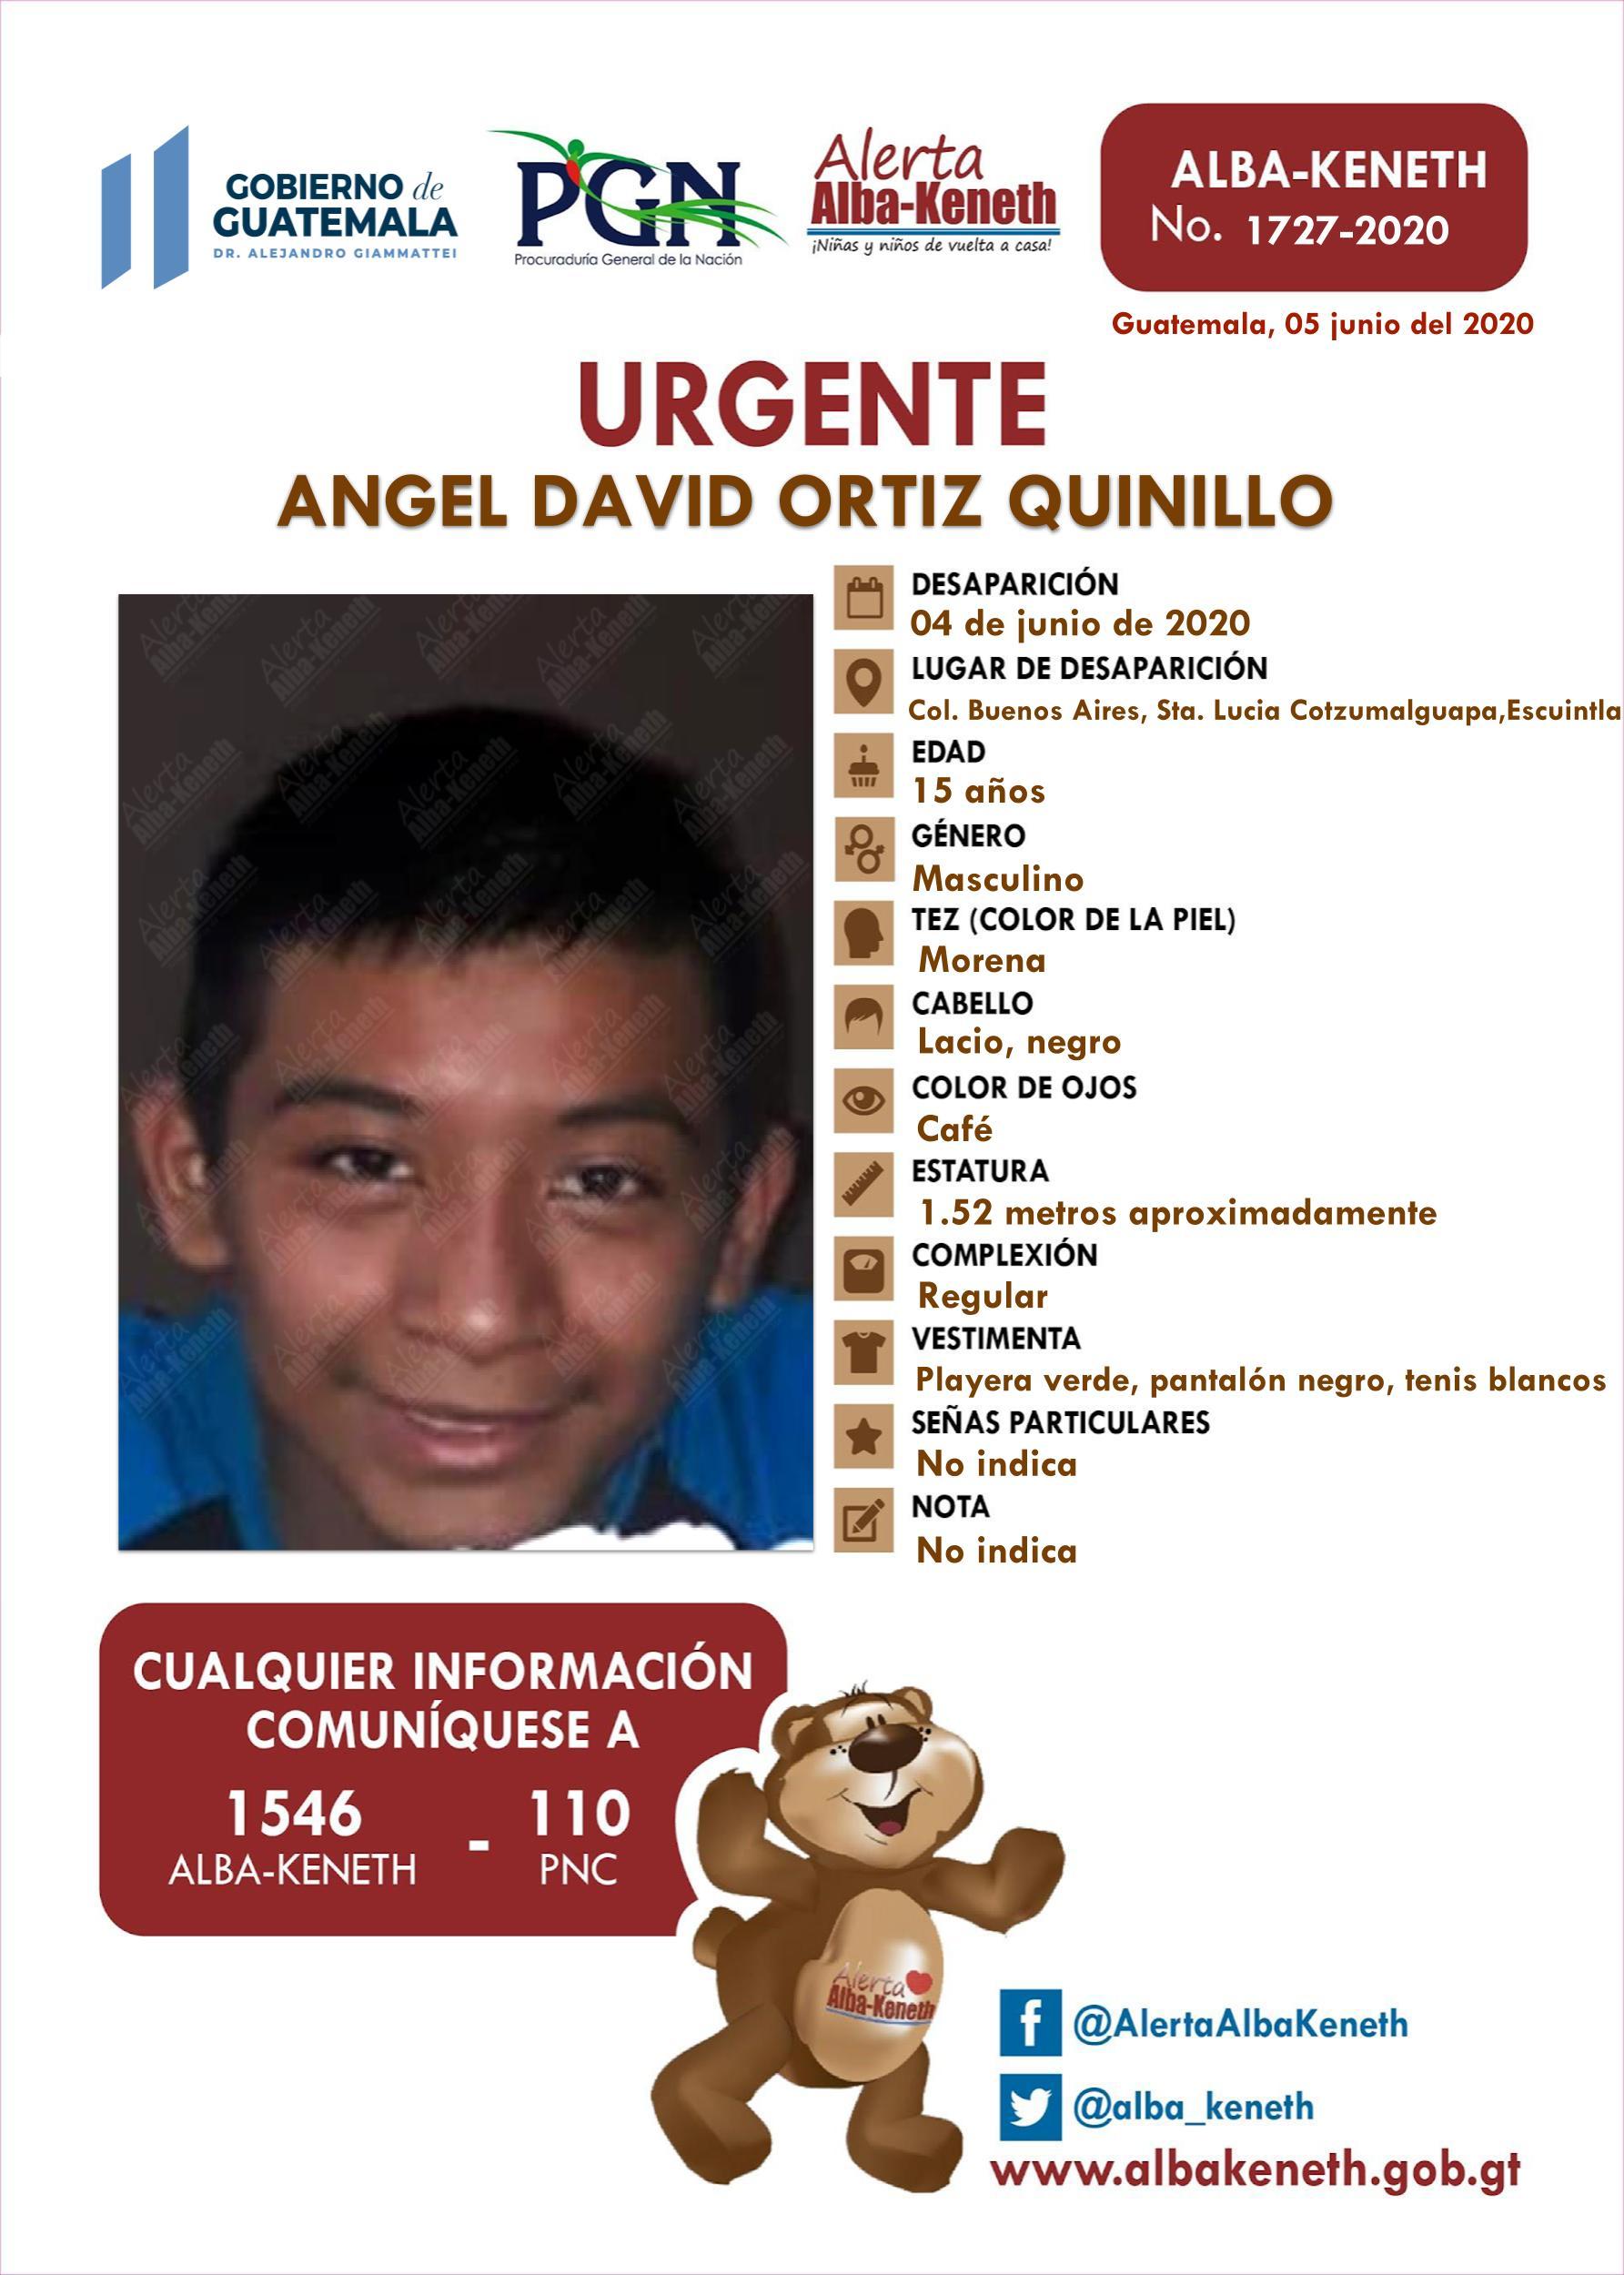 Angel David Ortiz Quinillo